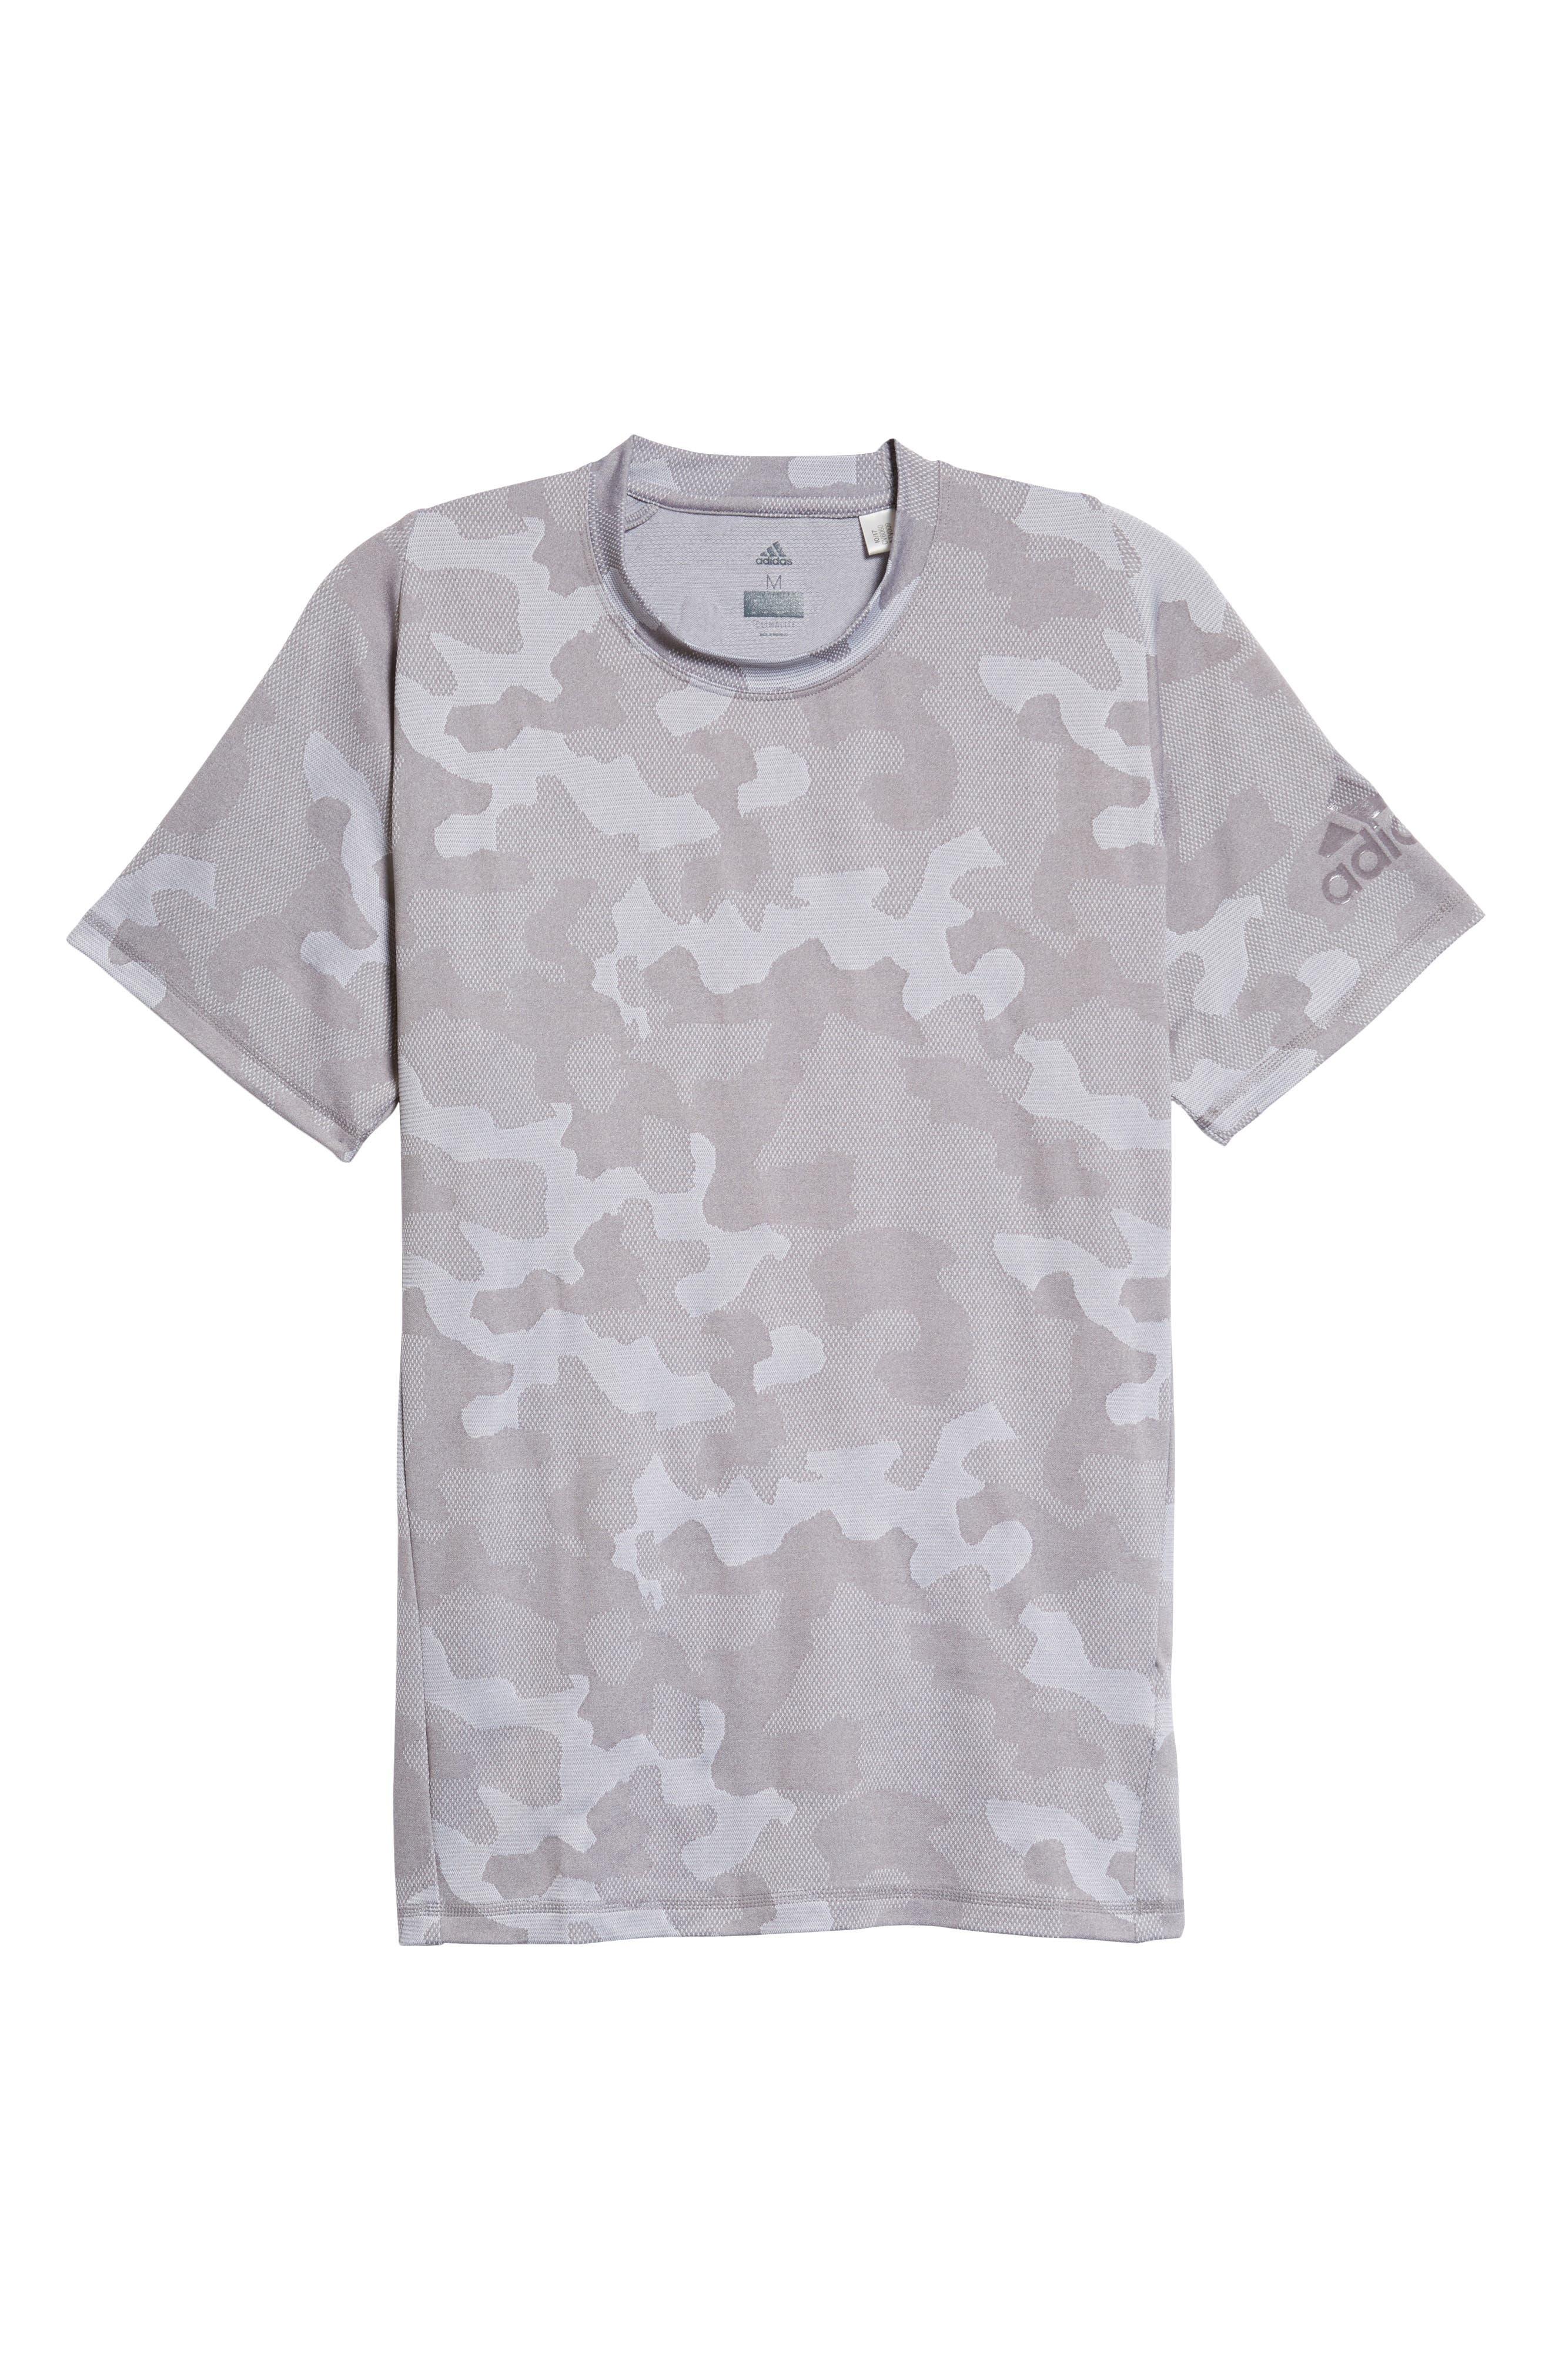 Camo Hype T-Shirt,                             Alternate thumbnail 7, color,                             Grey Three / White